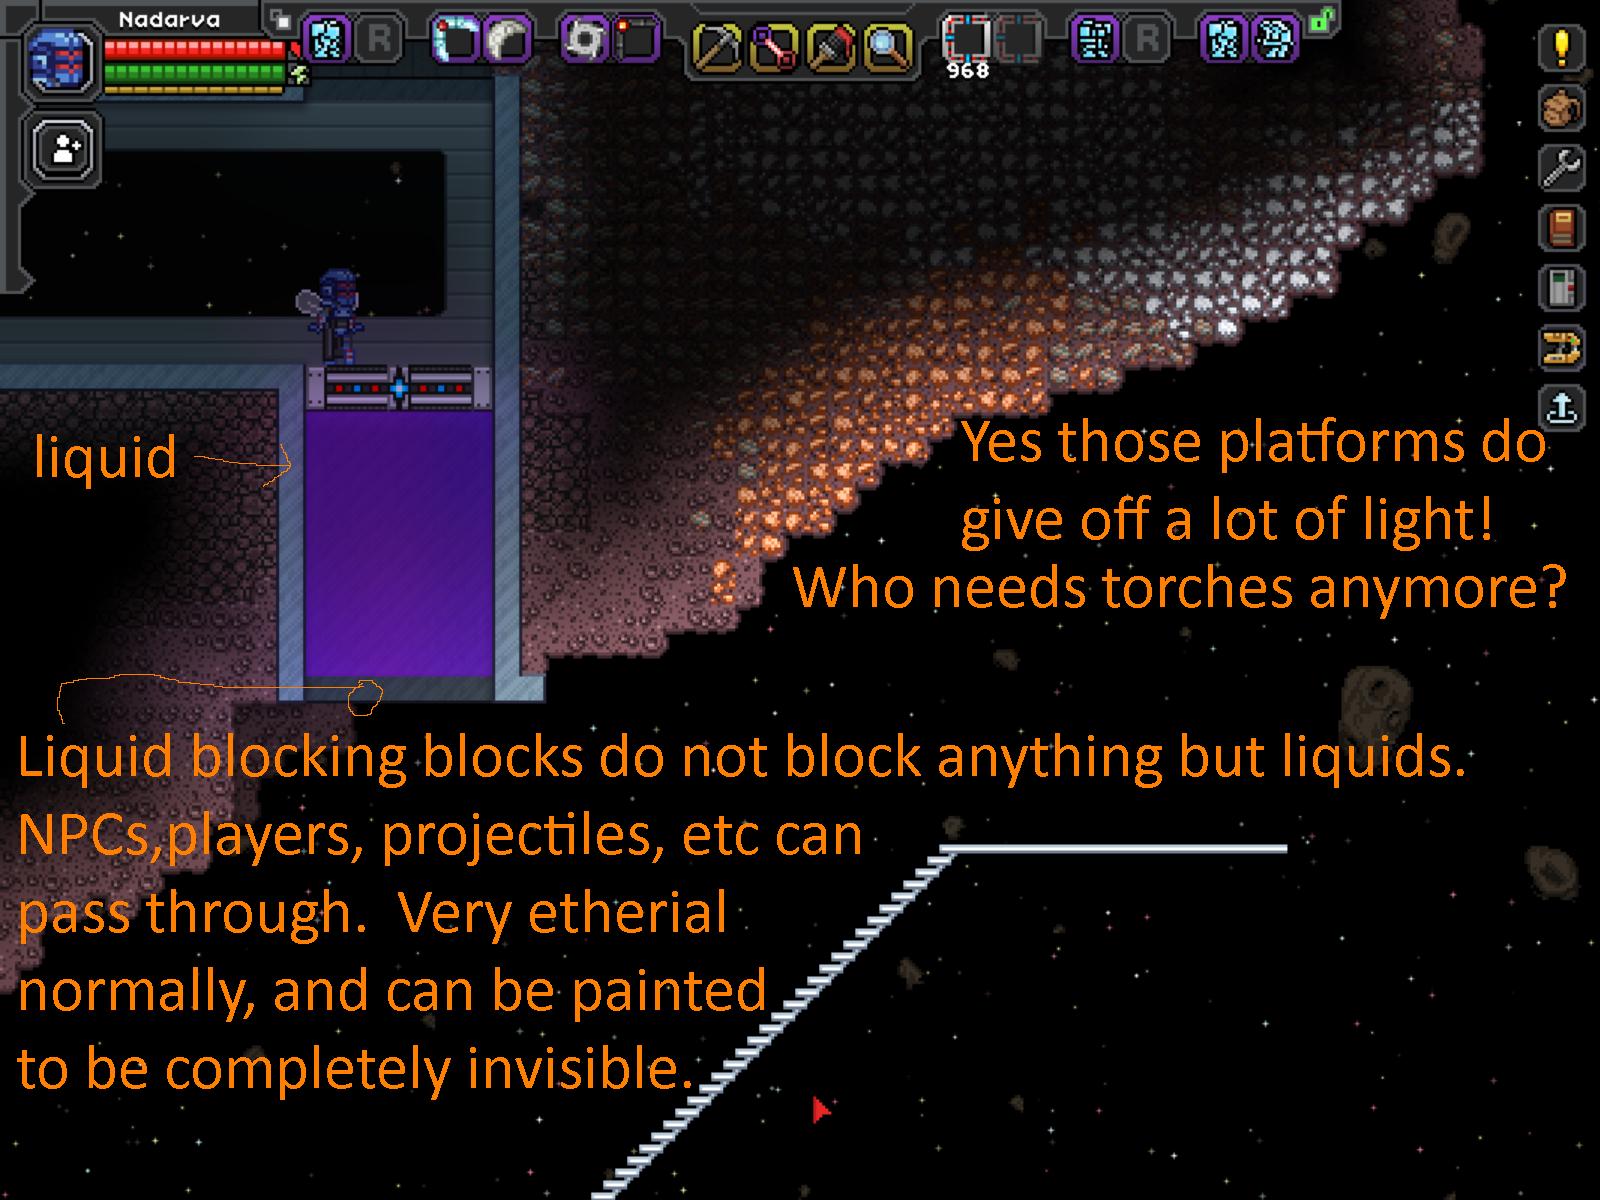 liquid-blocking blocks and lighted platforms.png